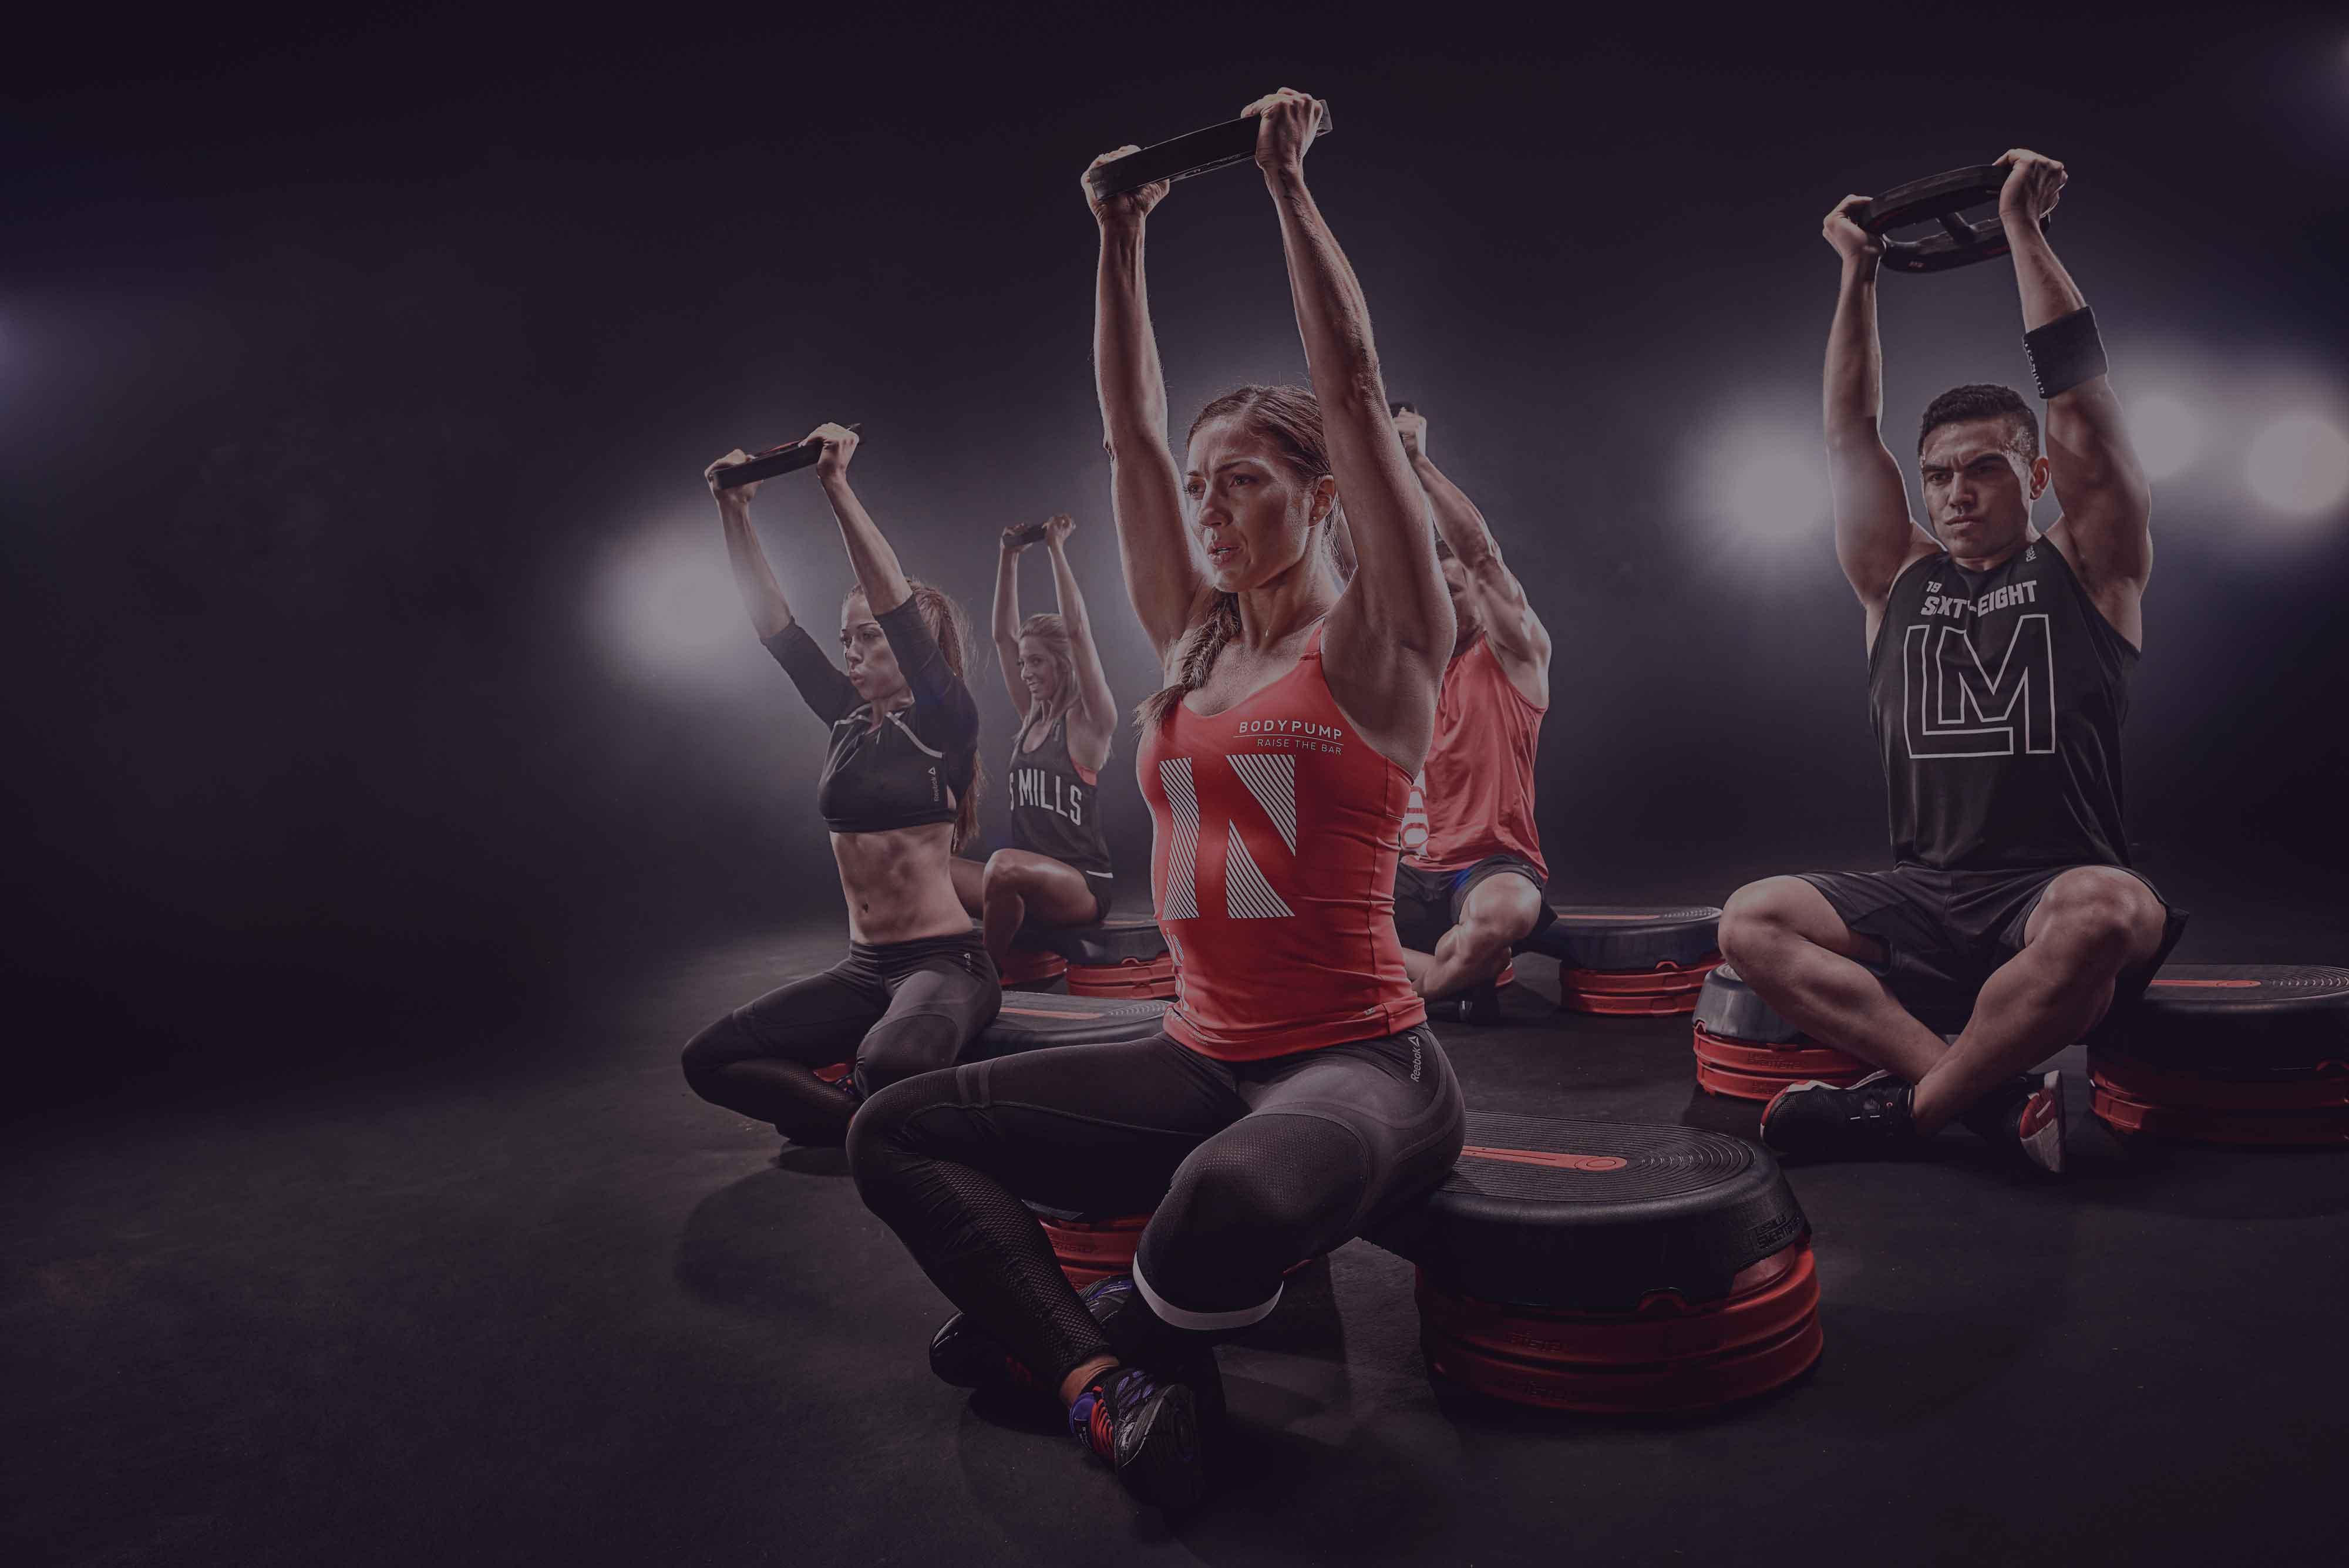 fitclub fitness ouistreham caen